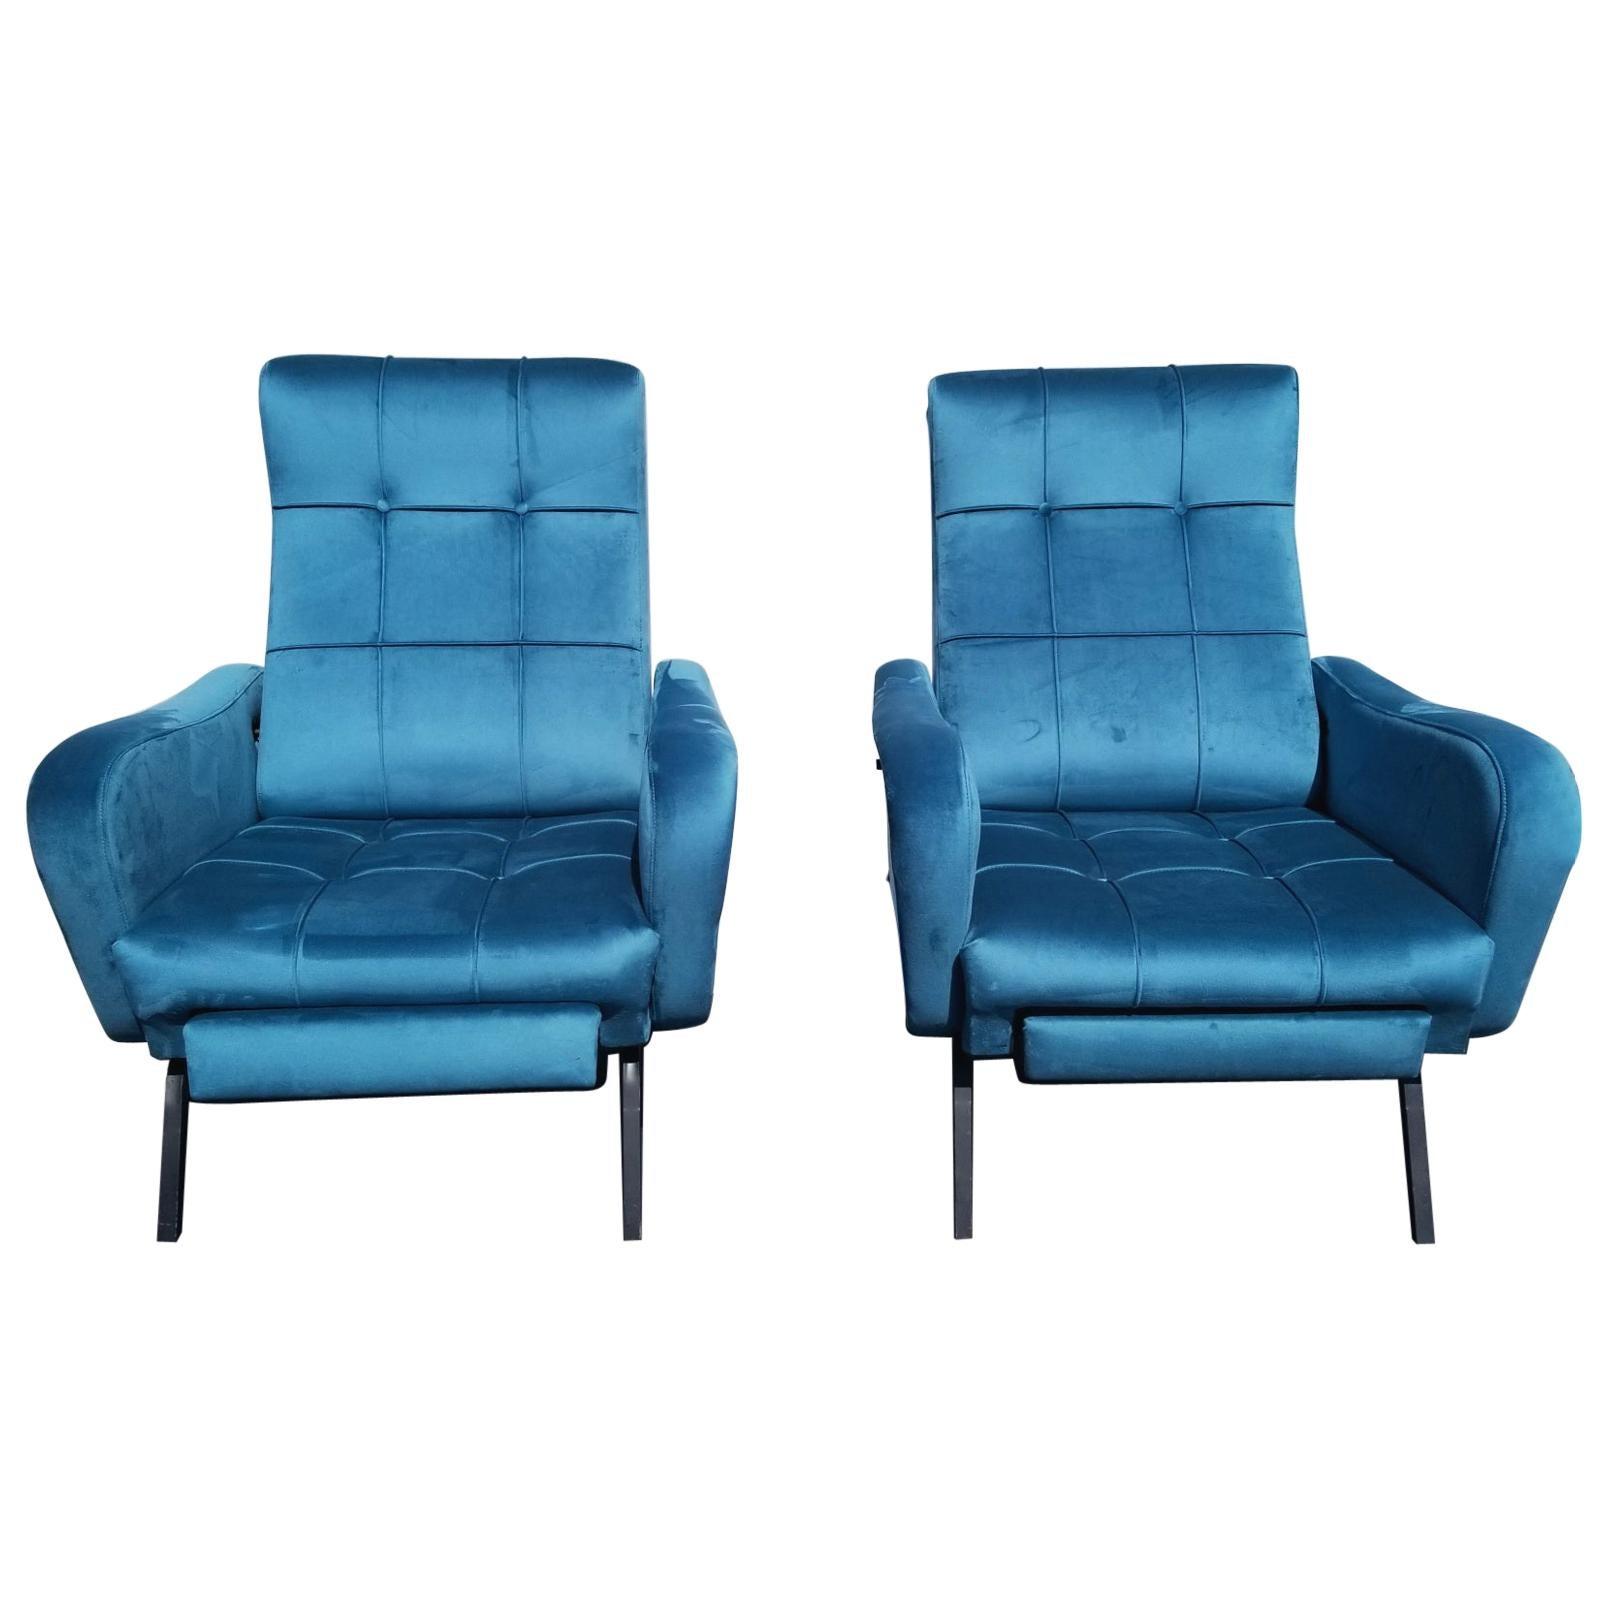 Italian Midcentury pair of Reclining Chairs